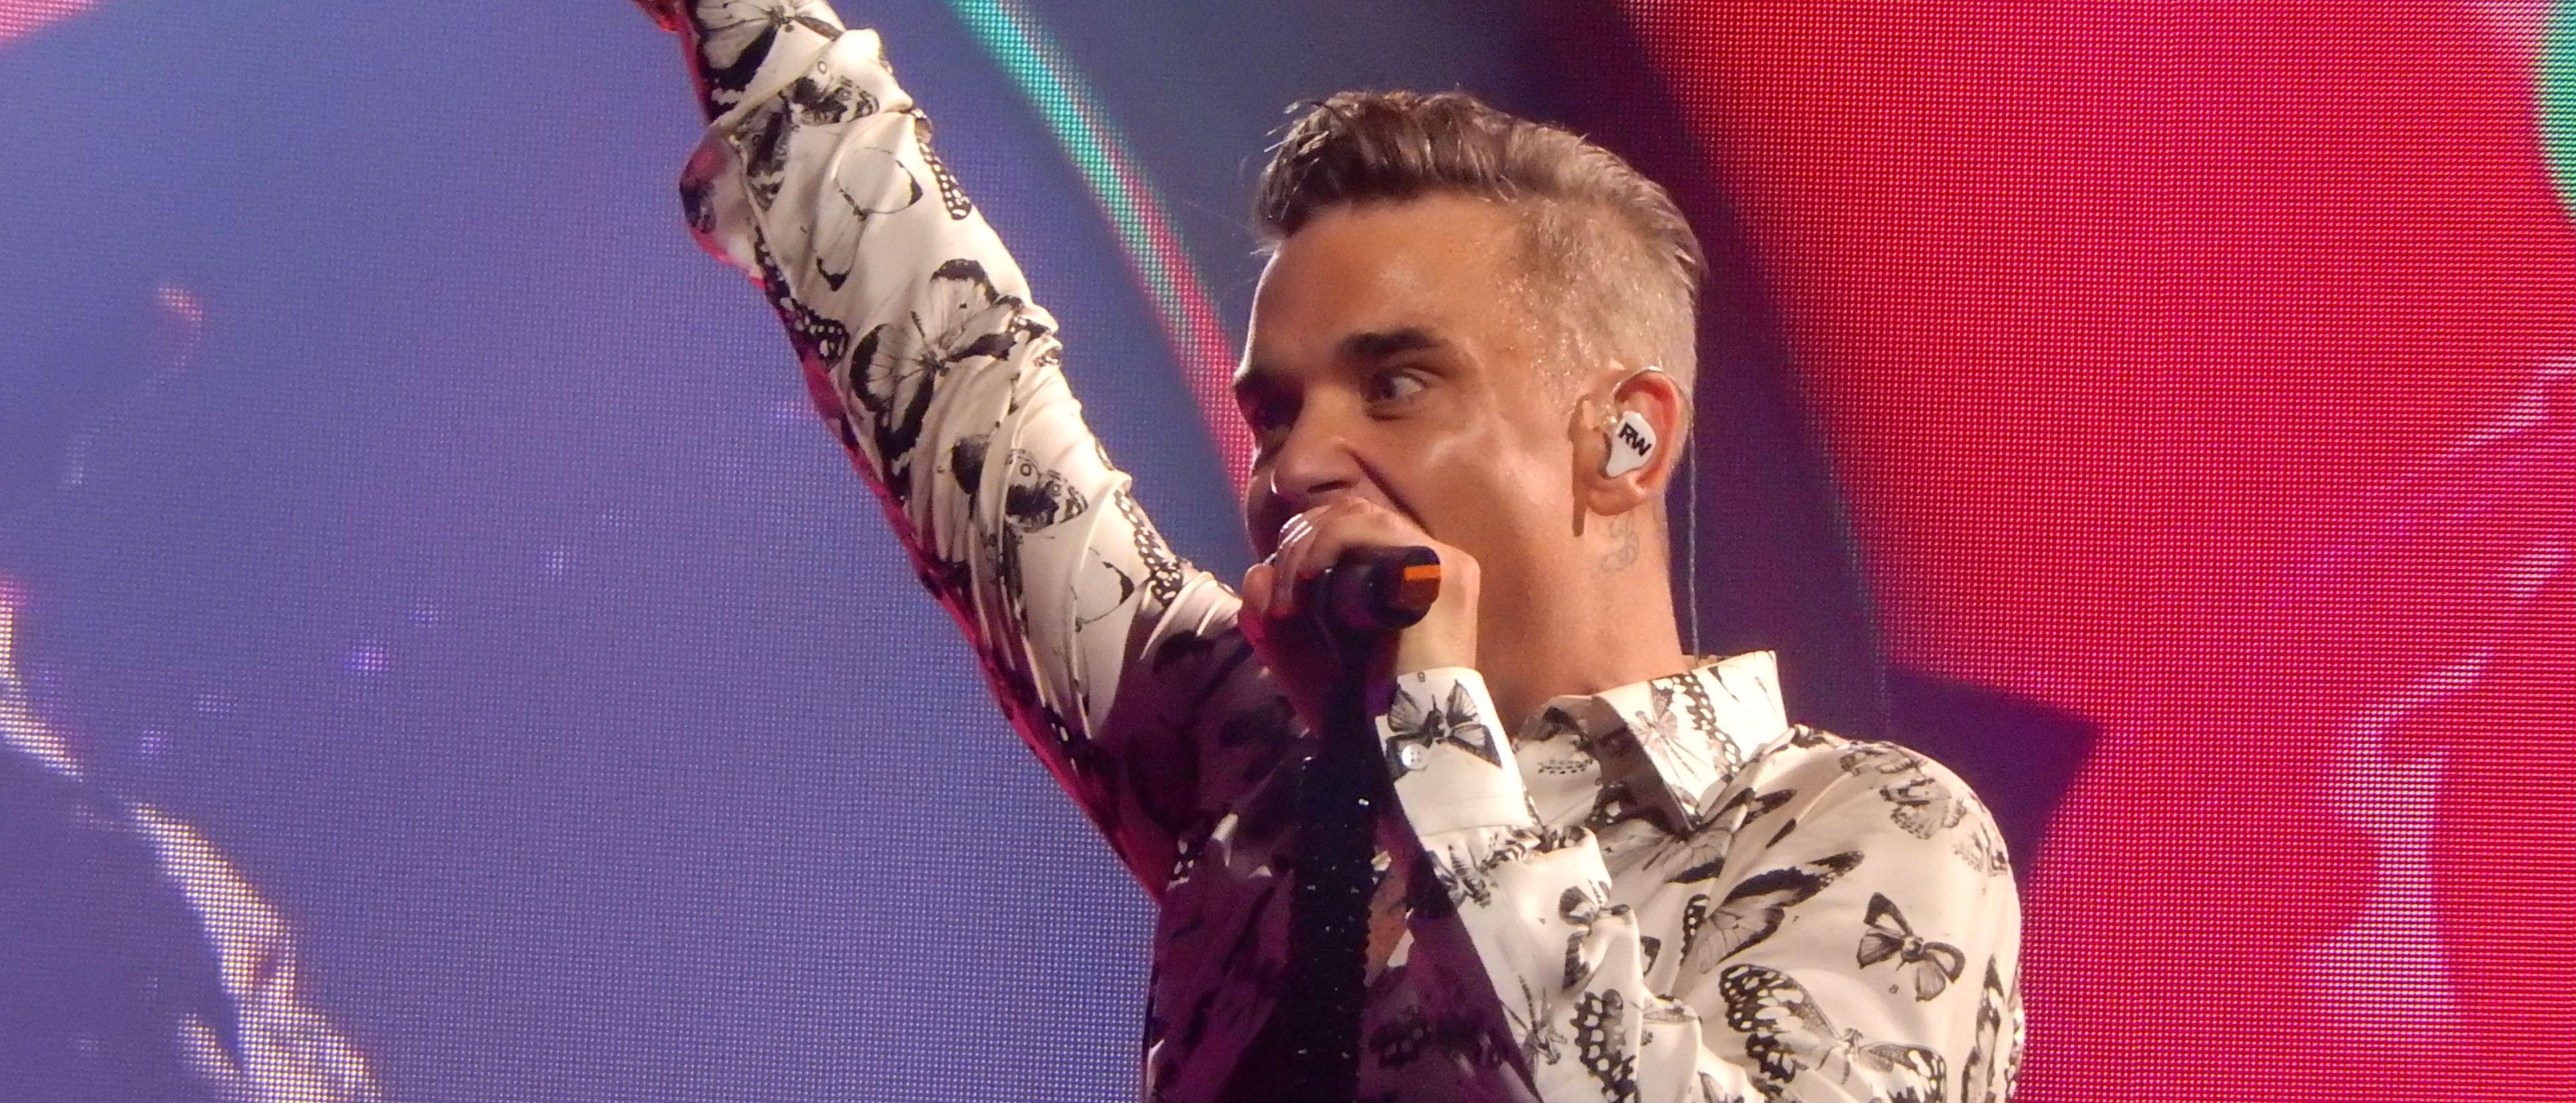 Tight Security for Robbie Williams Aviva Gig